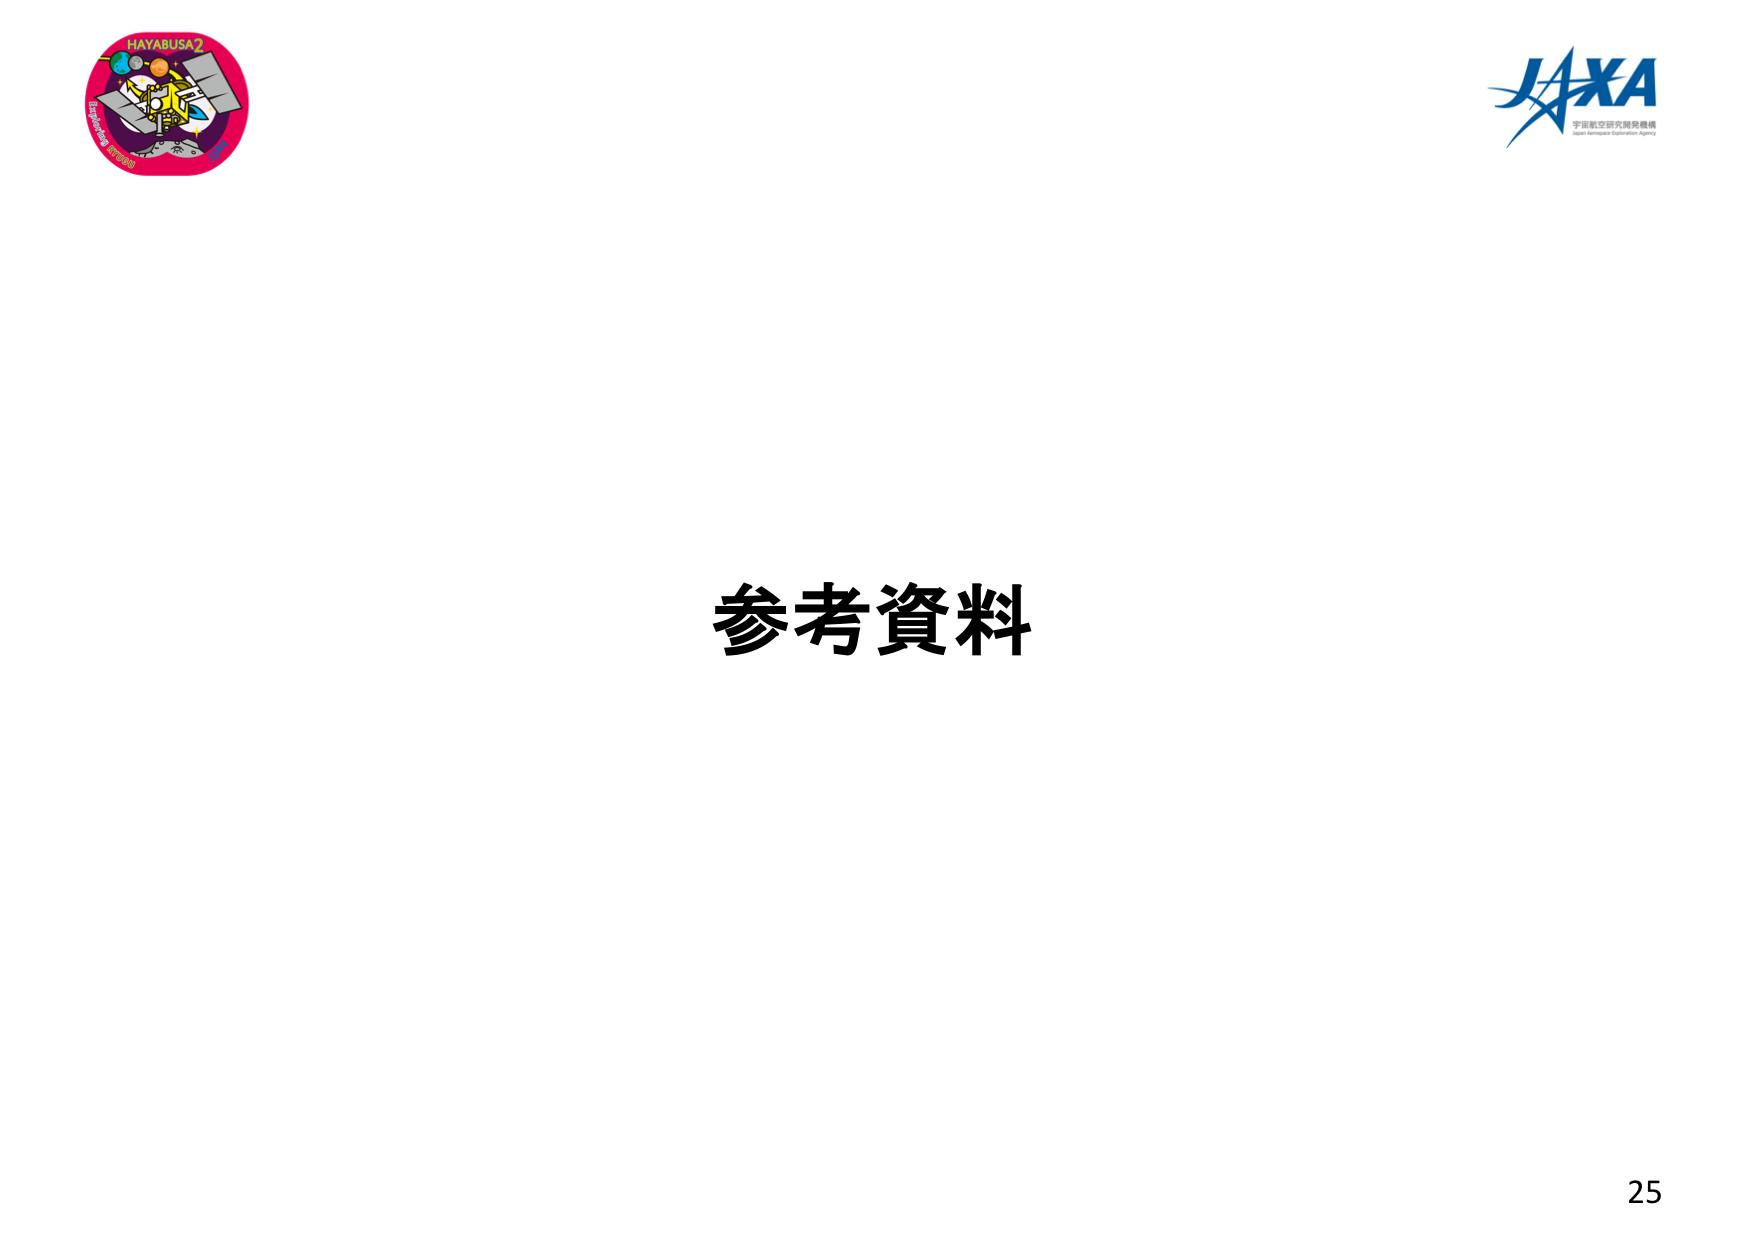 f:id:Imamura:20180905231957p:plain